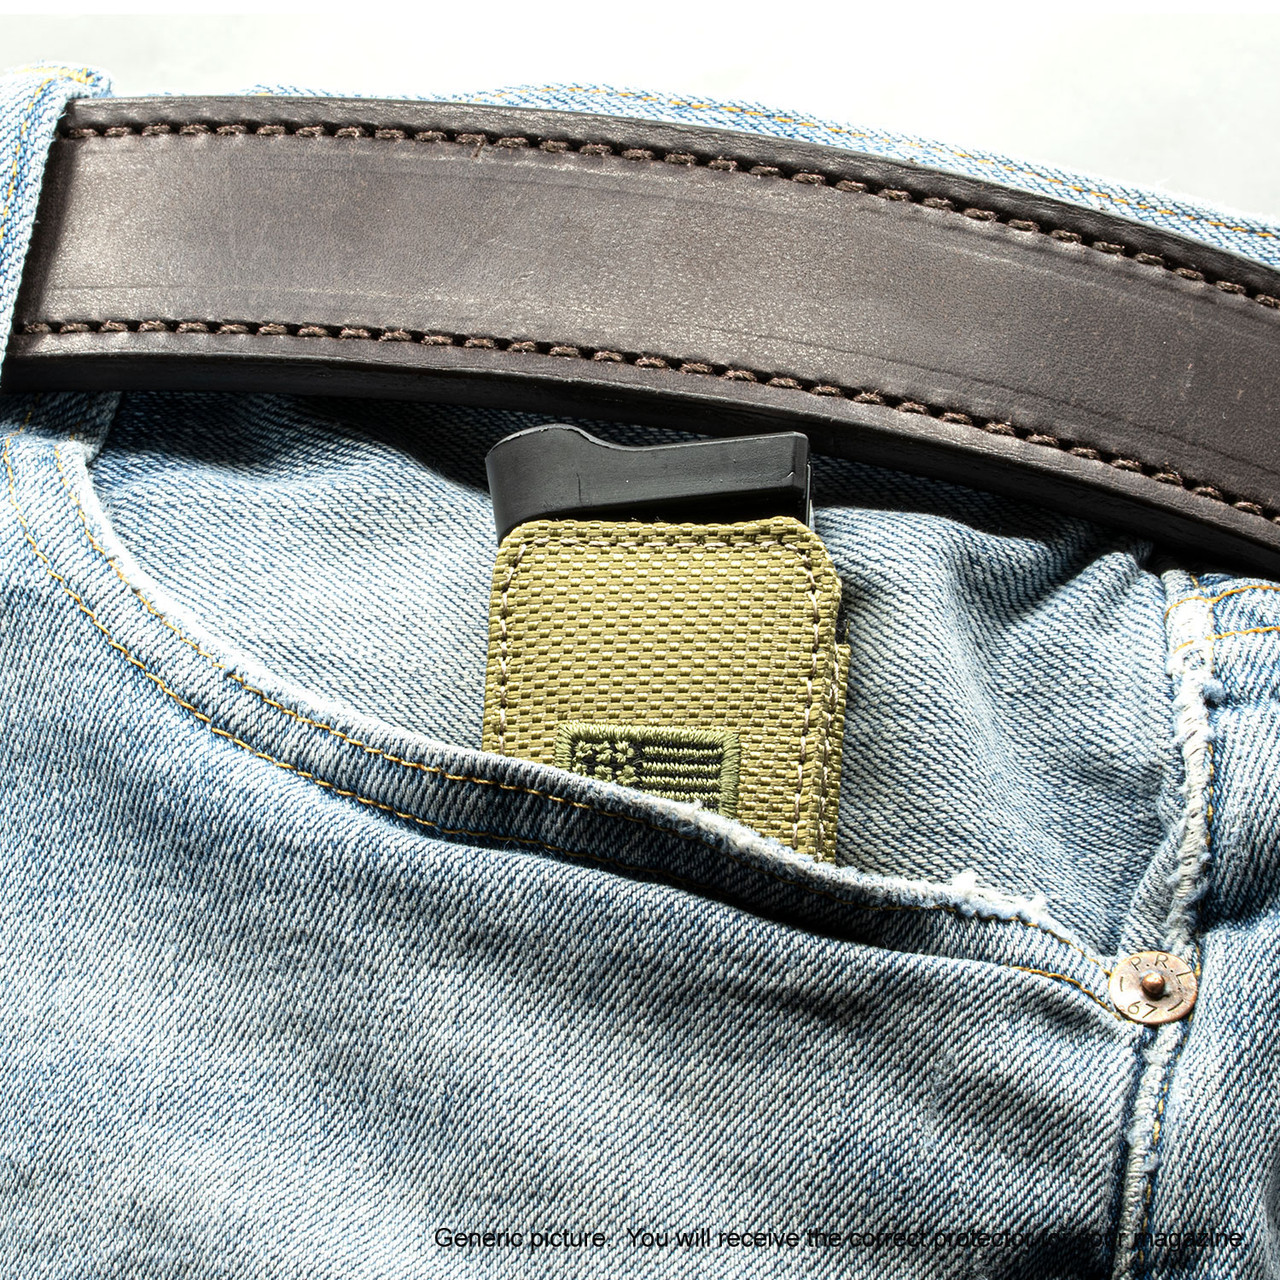 Glock 19X Green Canvas Flag Magazine Pocket Protector